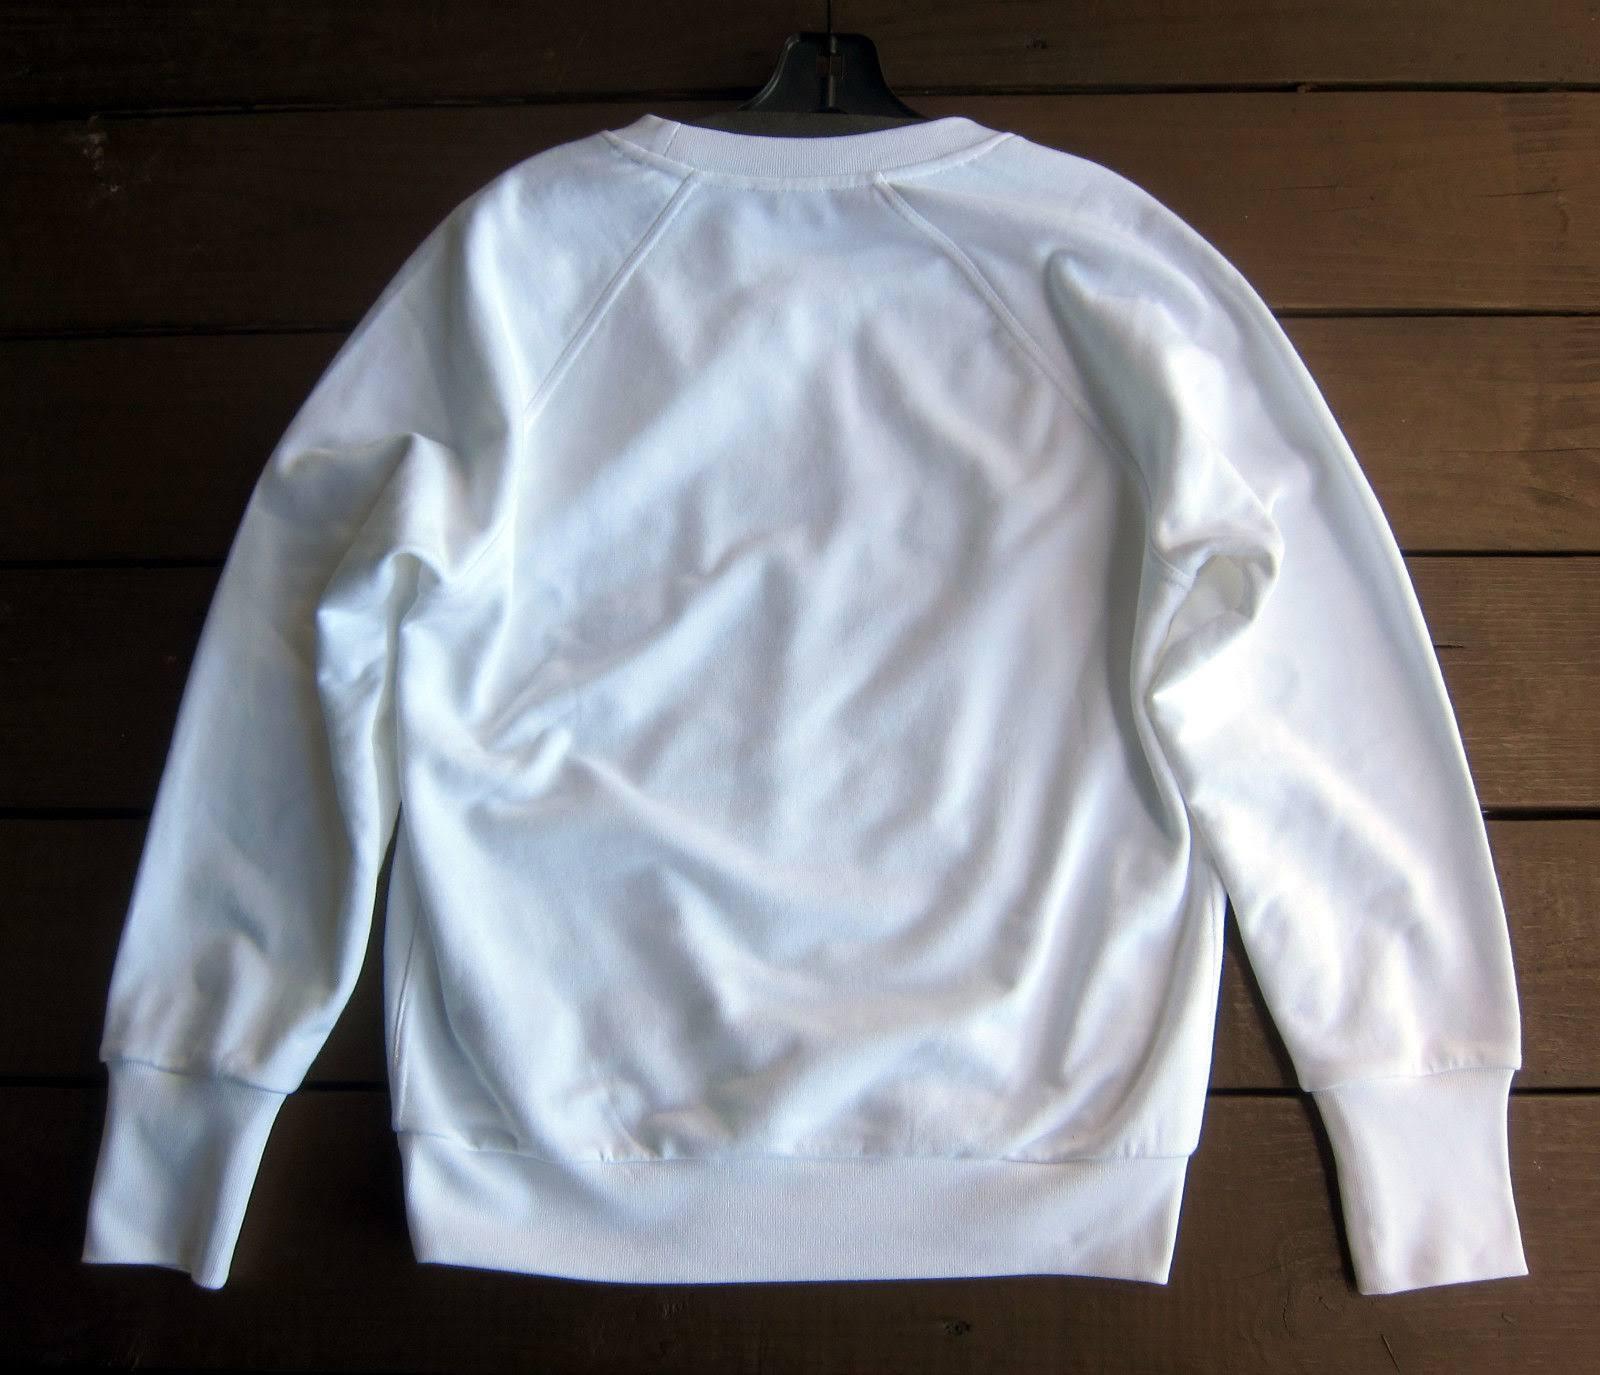 Blanco Sweater Burberry Tamaño Battarni Retro Mujer Para Logo Xs De qEE0wZ7